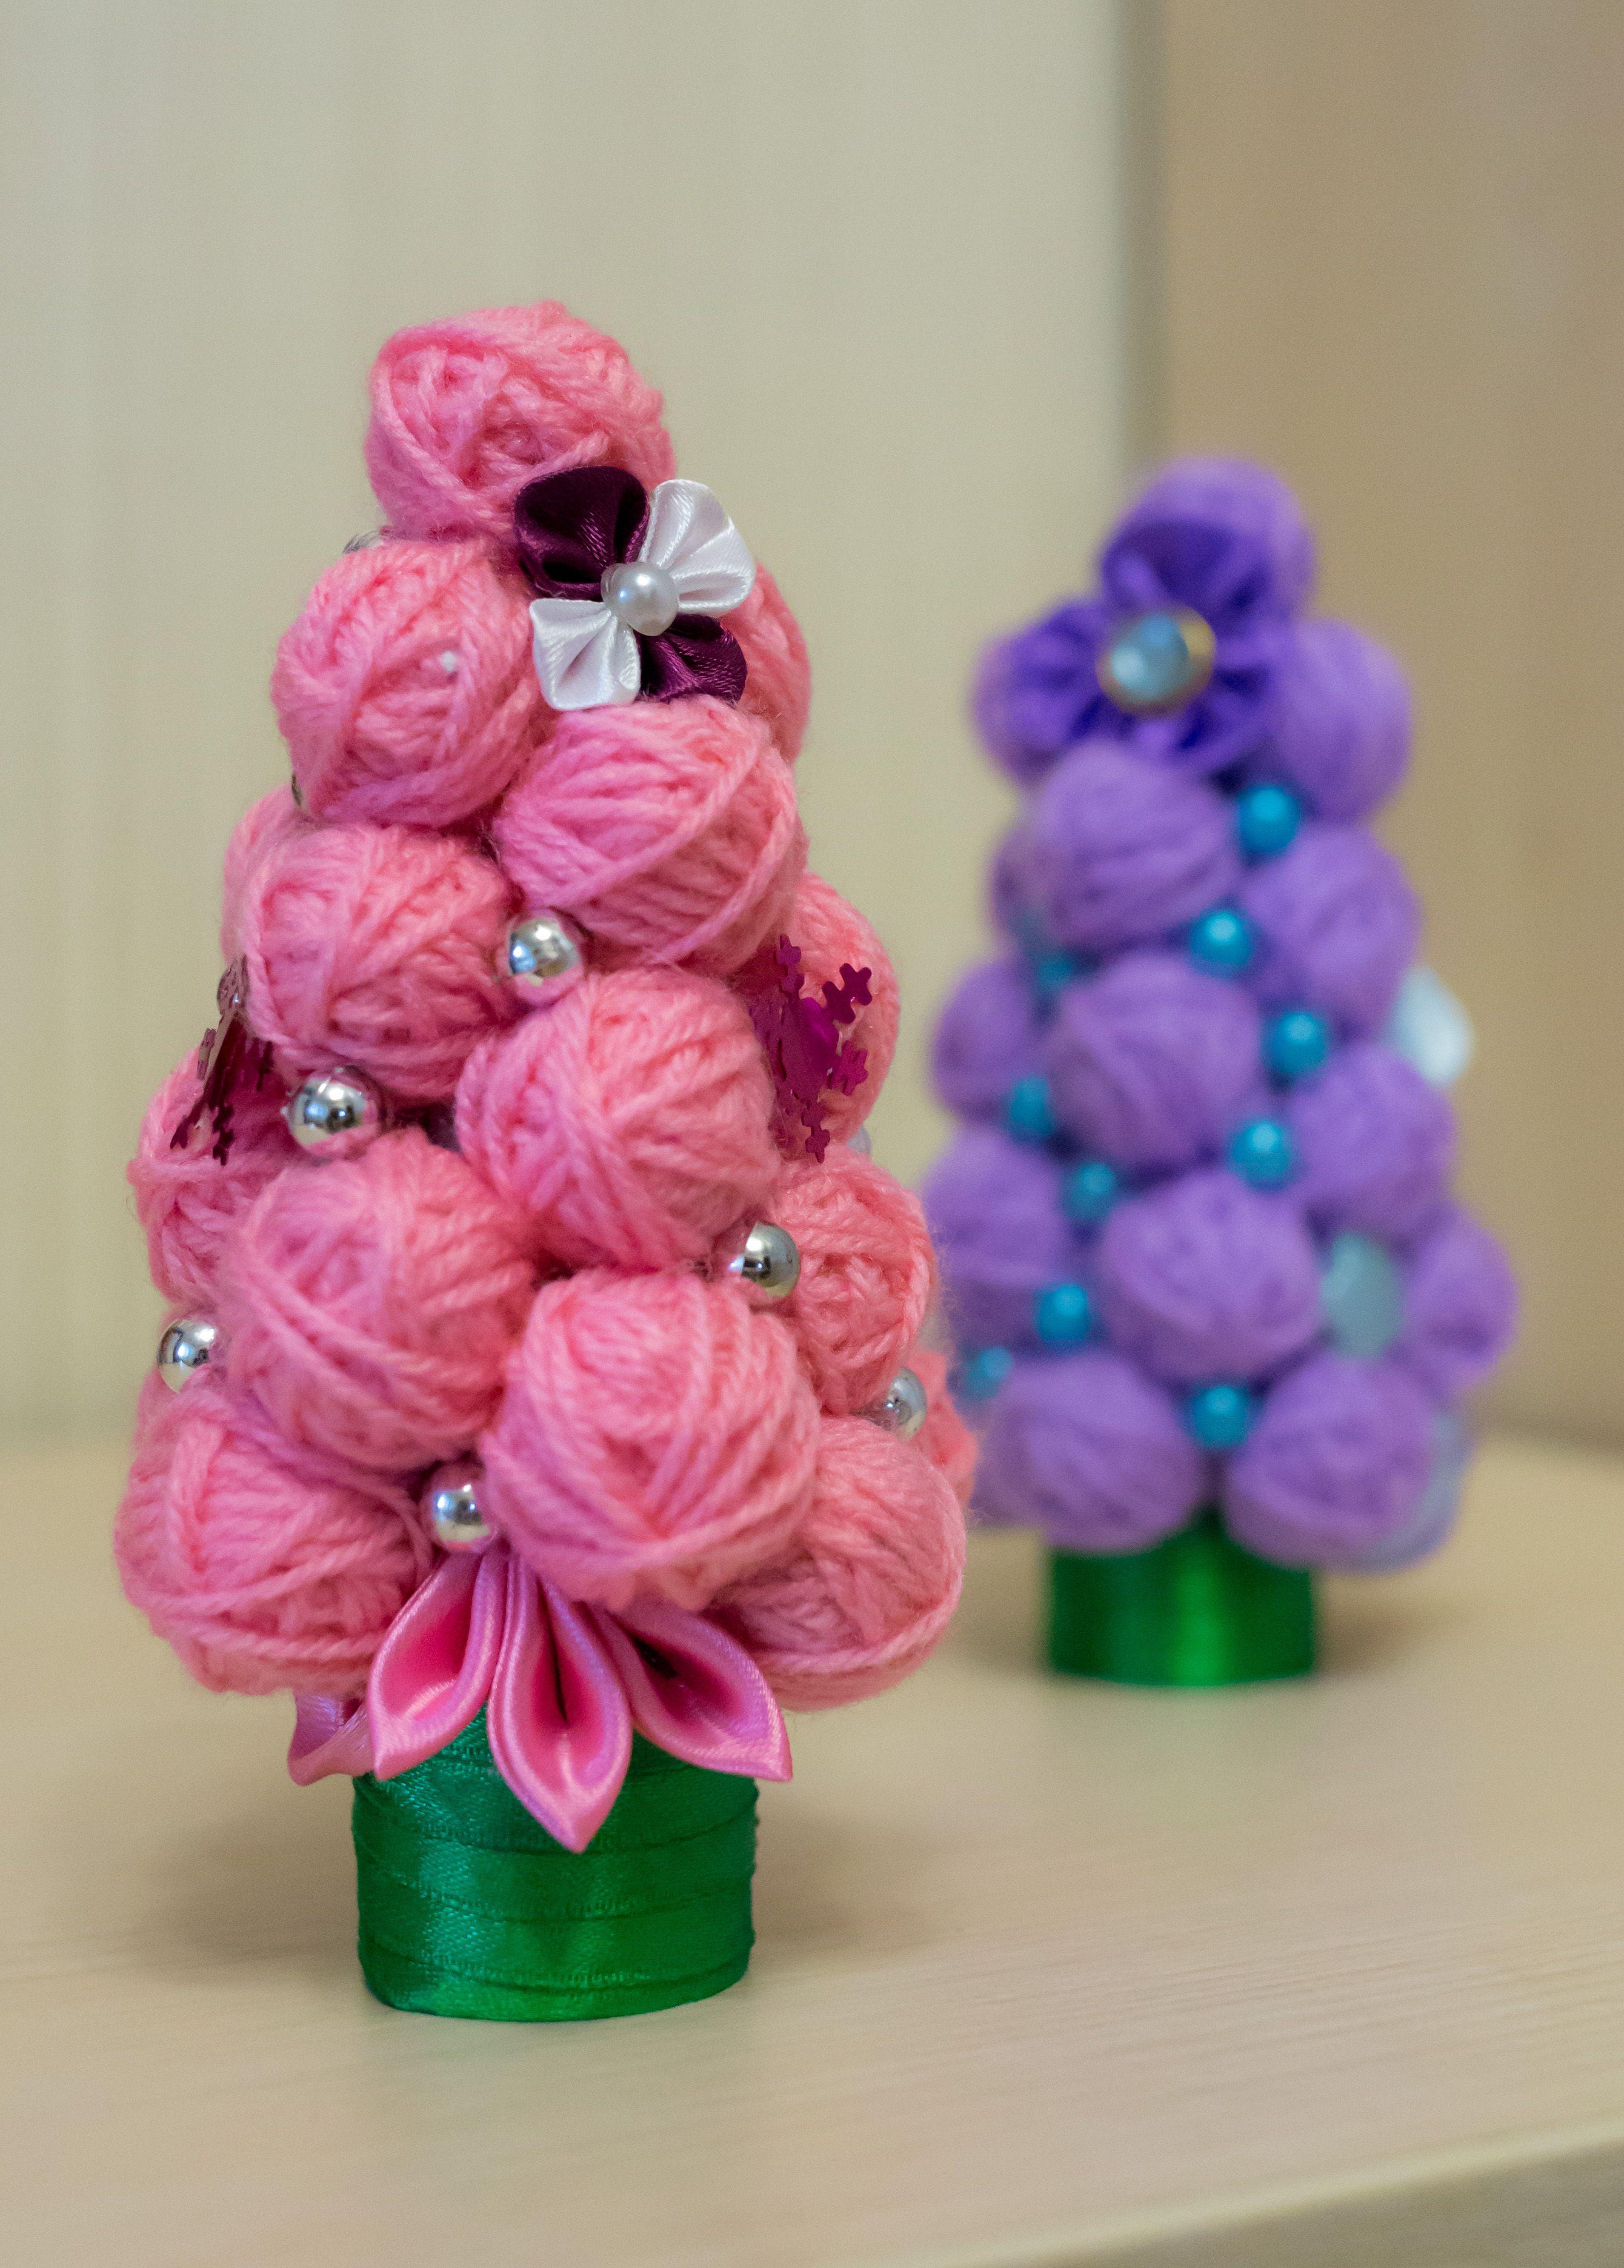 елочка хэнд-мейд бусинки творчество нитки подарок красивые